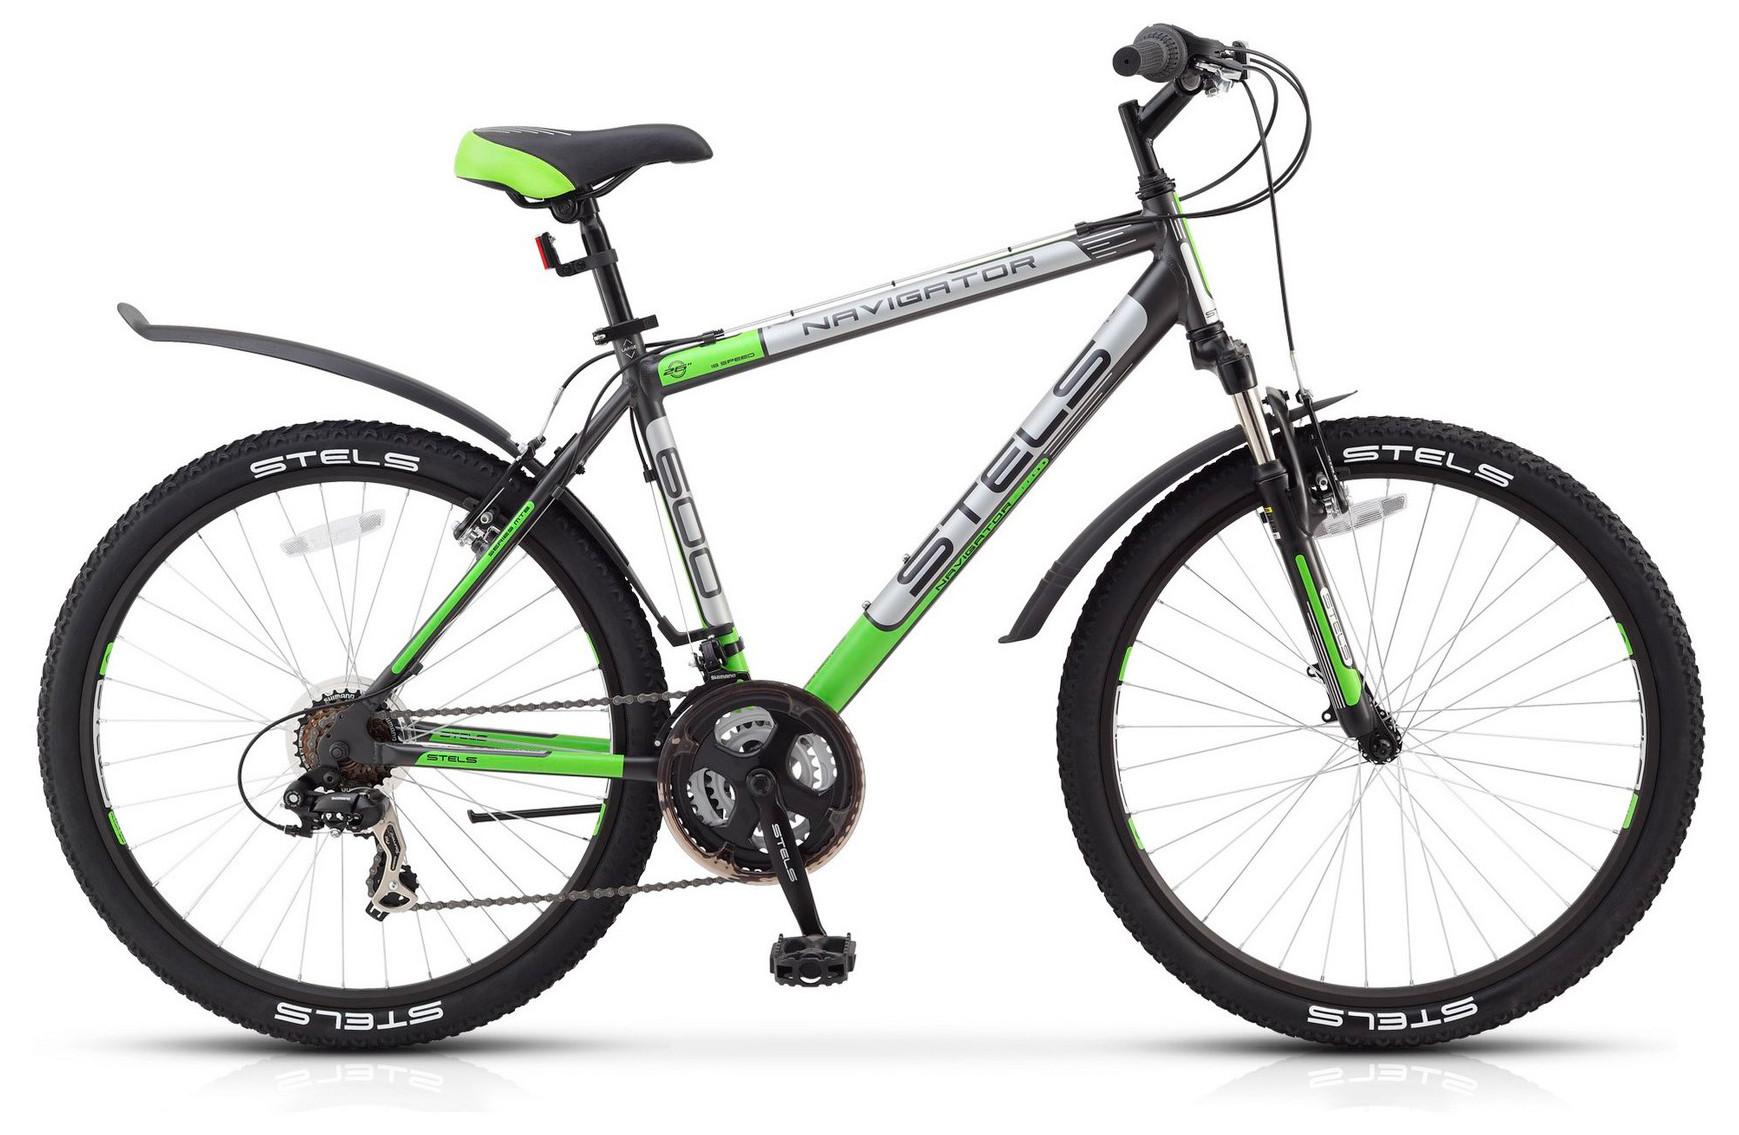 "Горный велосипед Stels Navigator-600V 2017 V030 рама 20"" черный/зеленый"